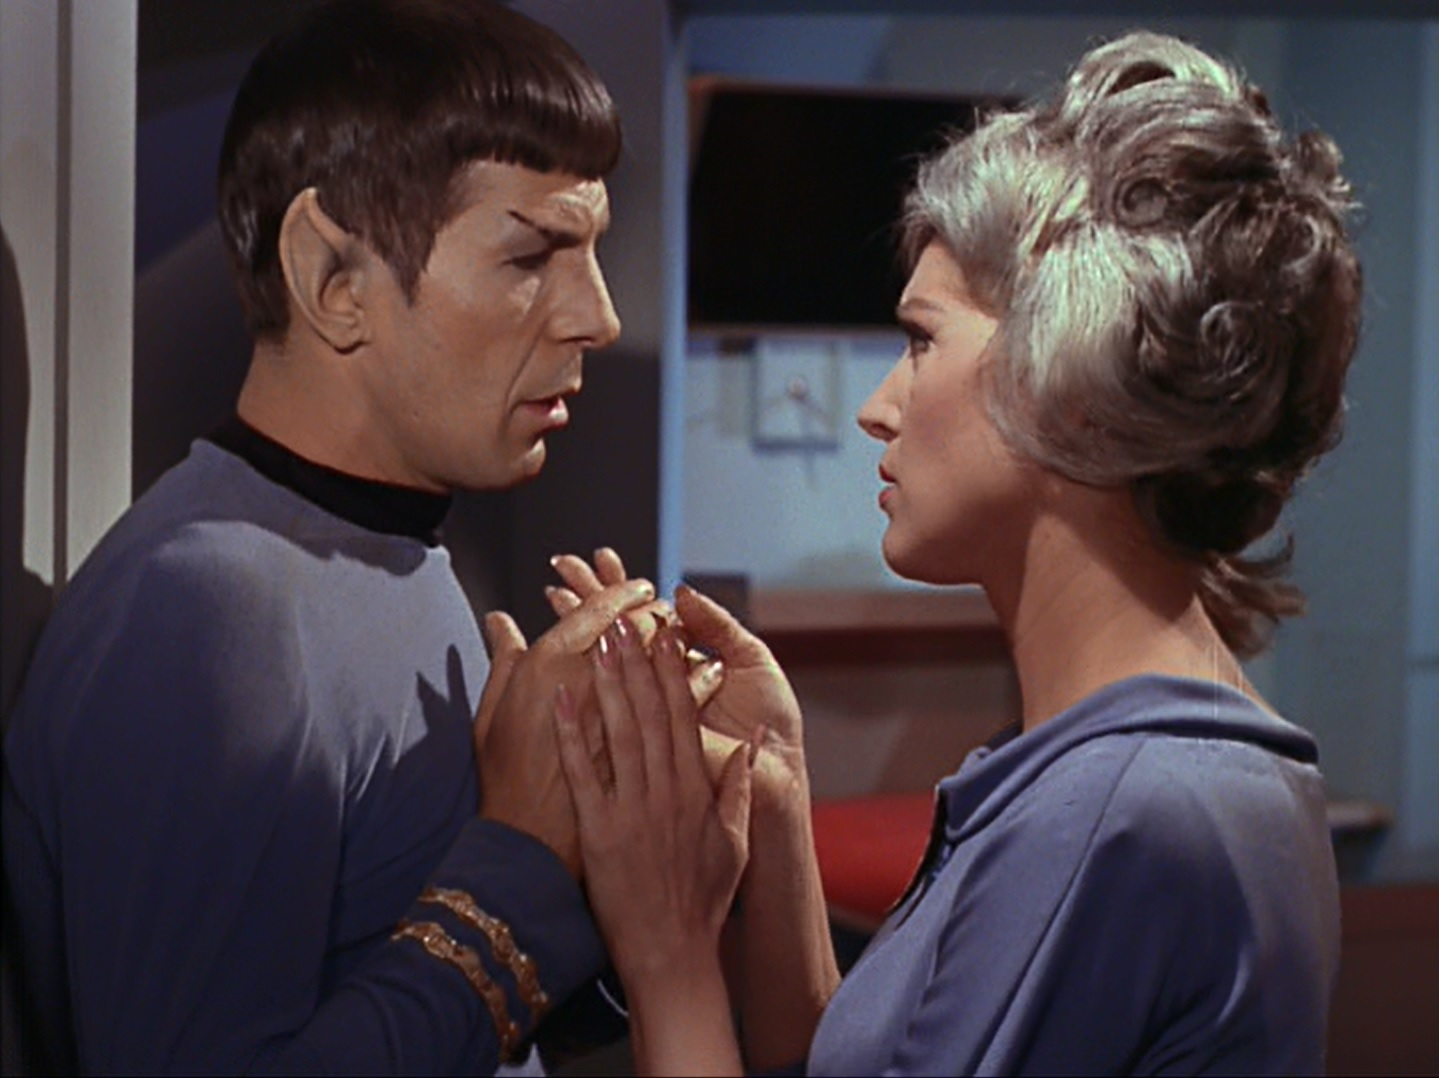 Deanna Troi Memory Beta, non-canon Star Trek Wiki